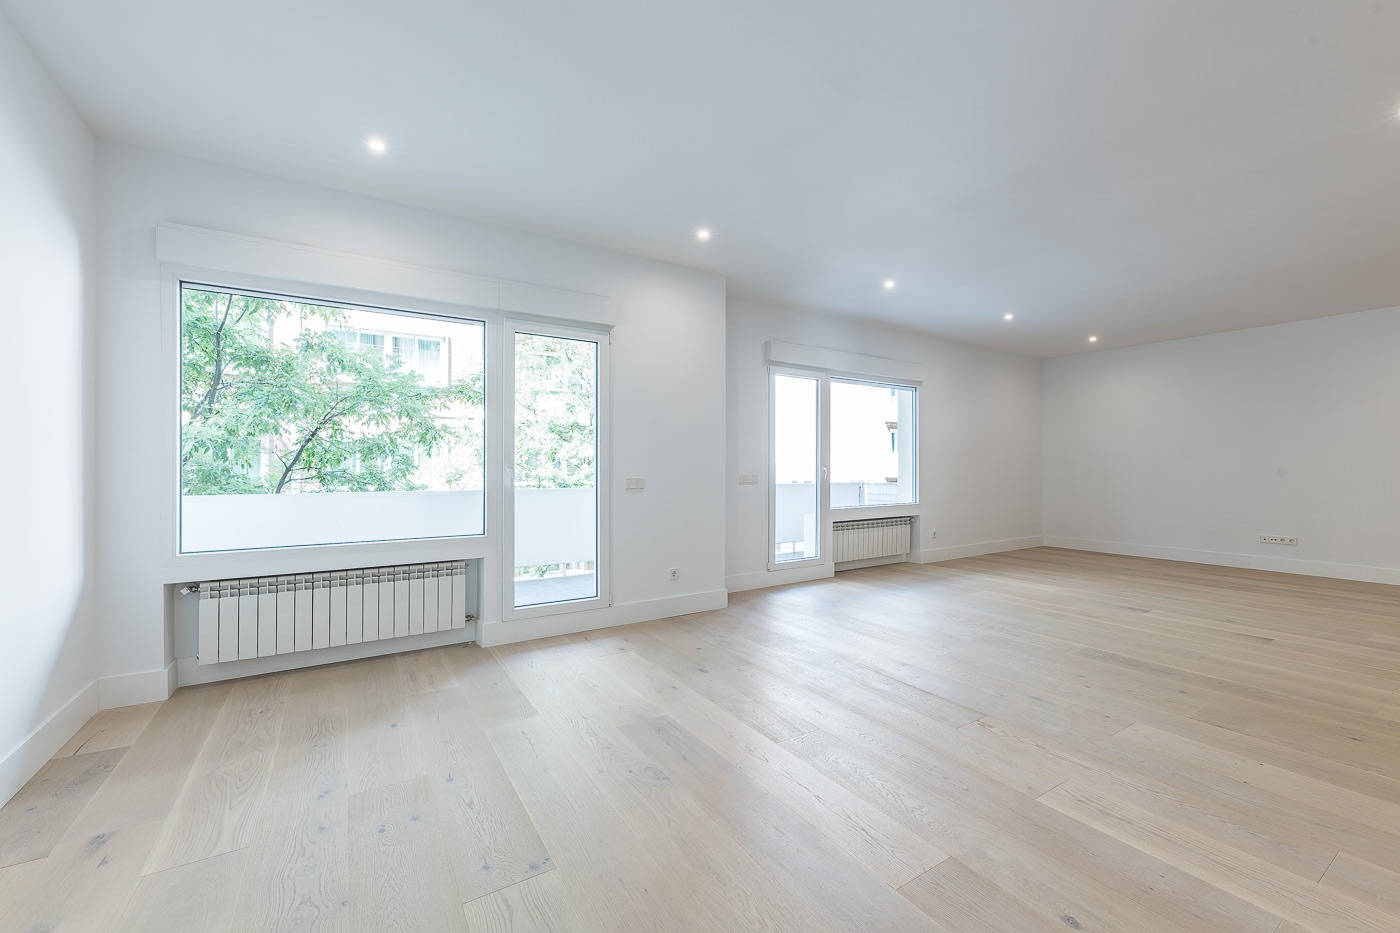 Apartamento em Madrid, chamberi, venda